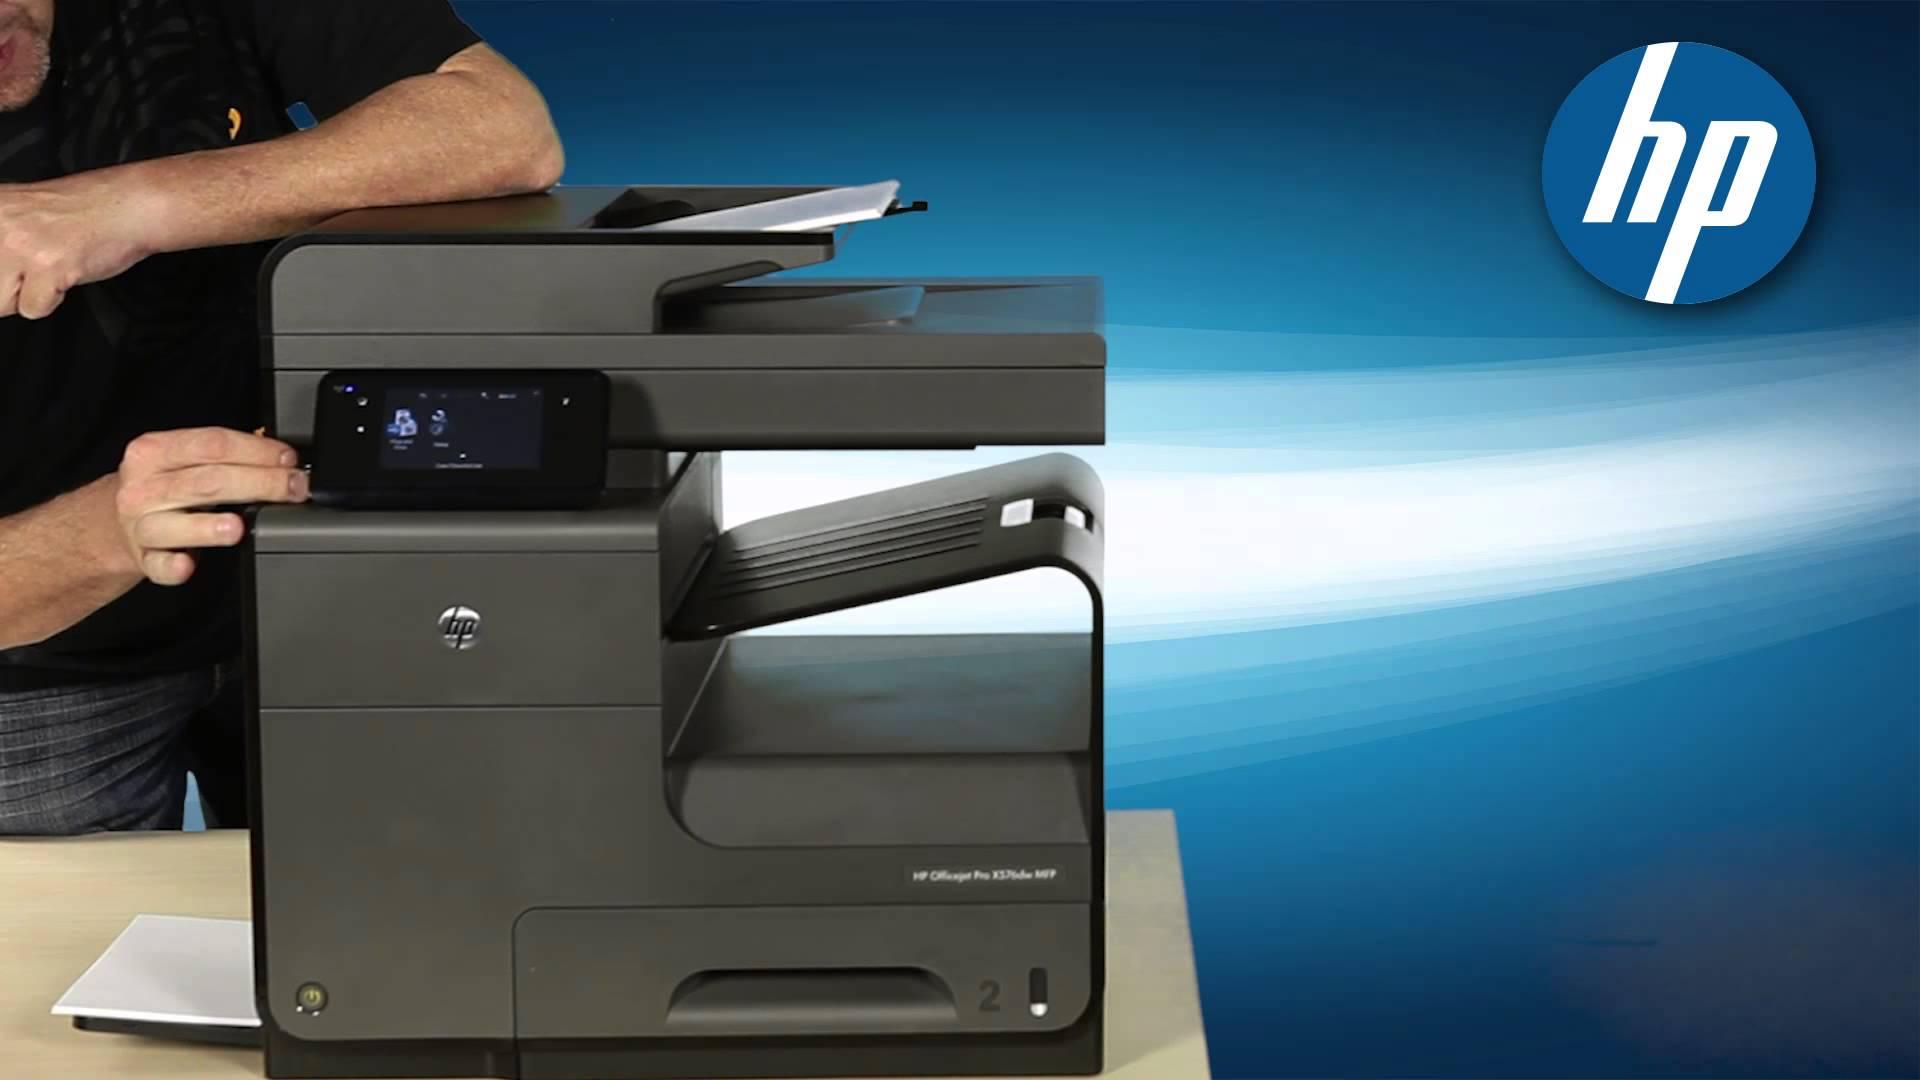 hpprinters-1.jpg